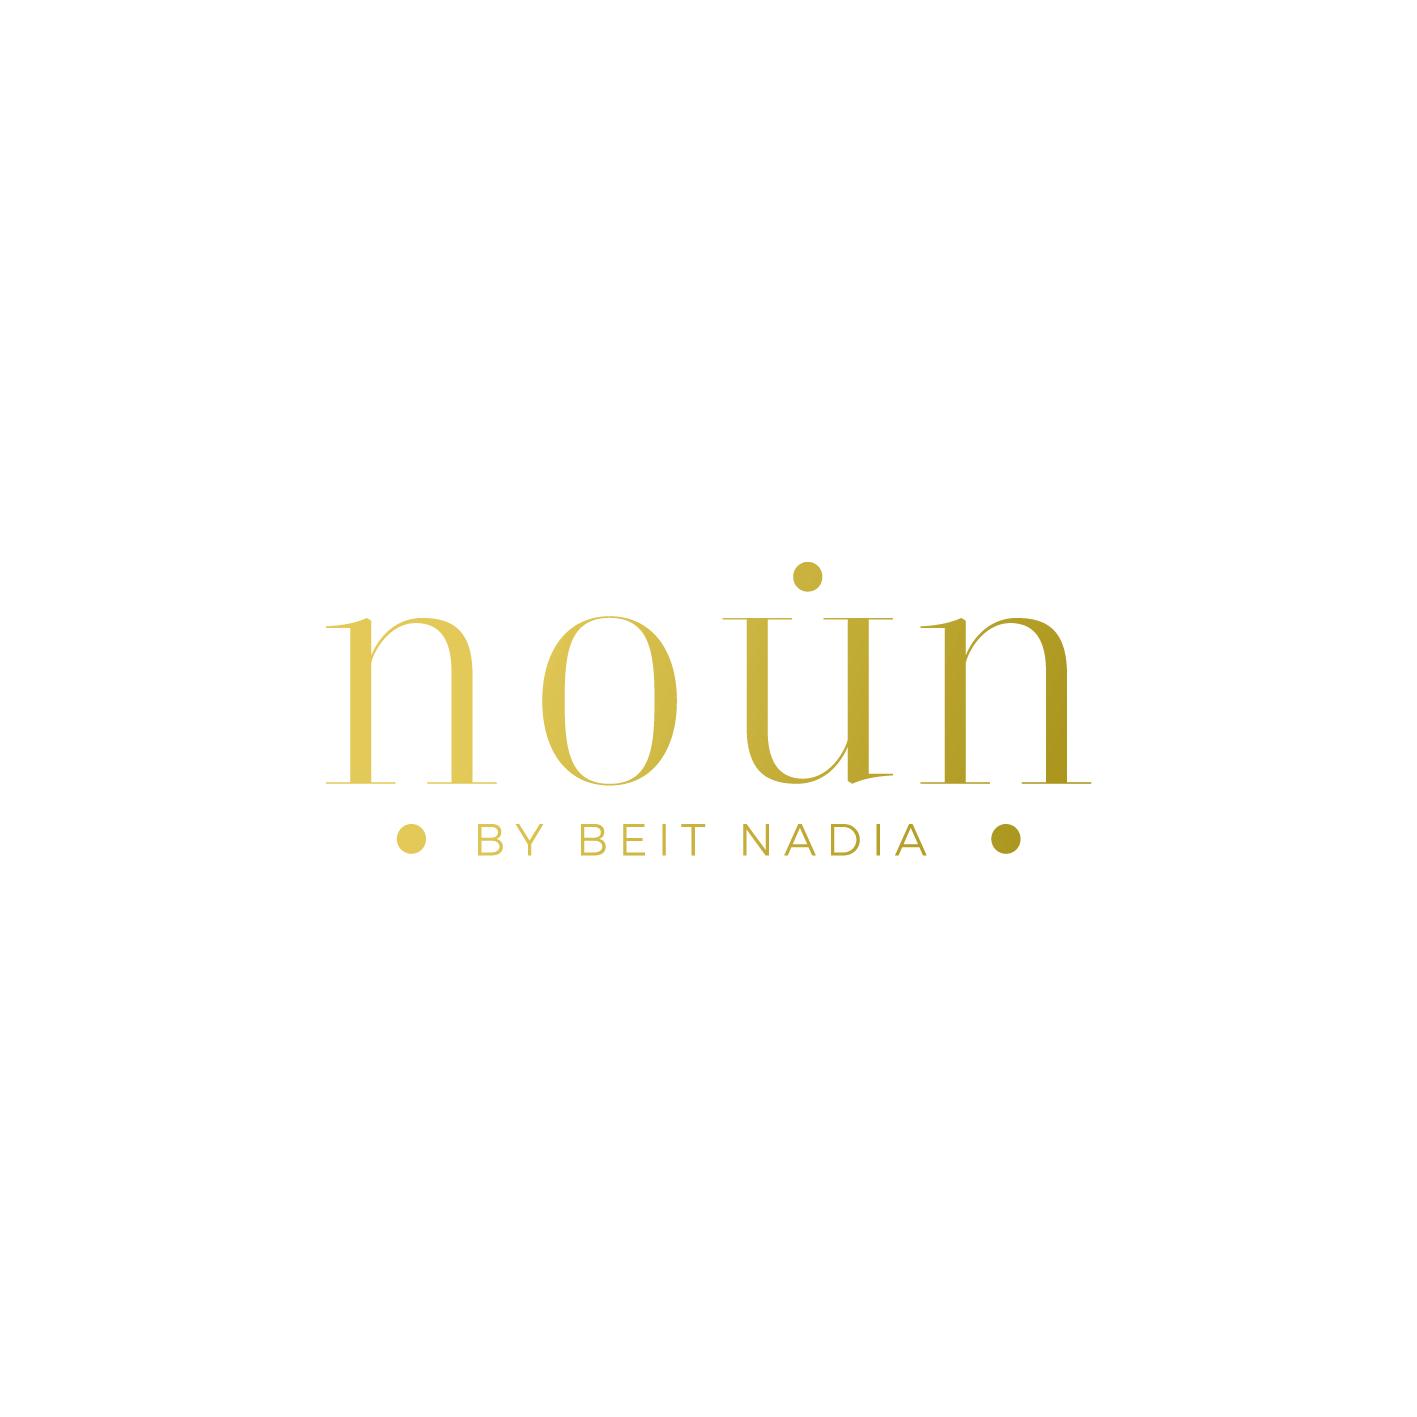 Noun by Beit Nadia